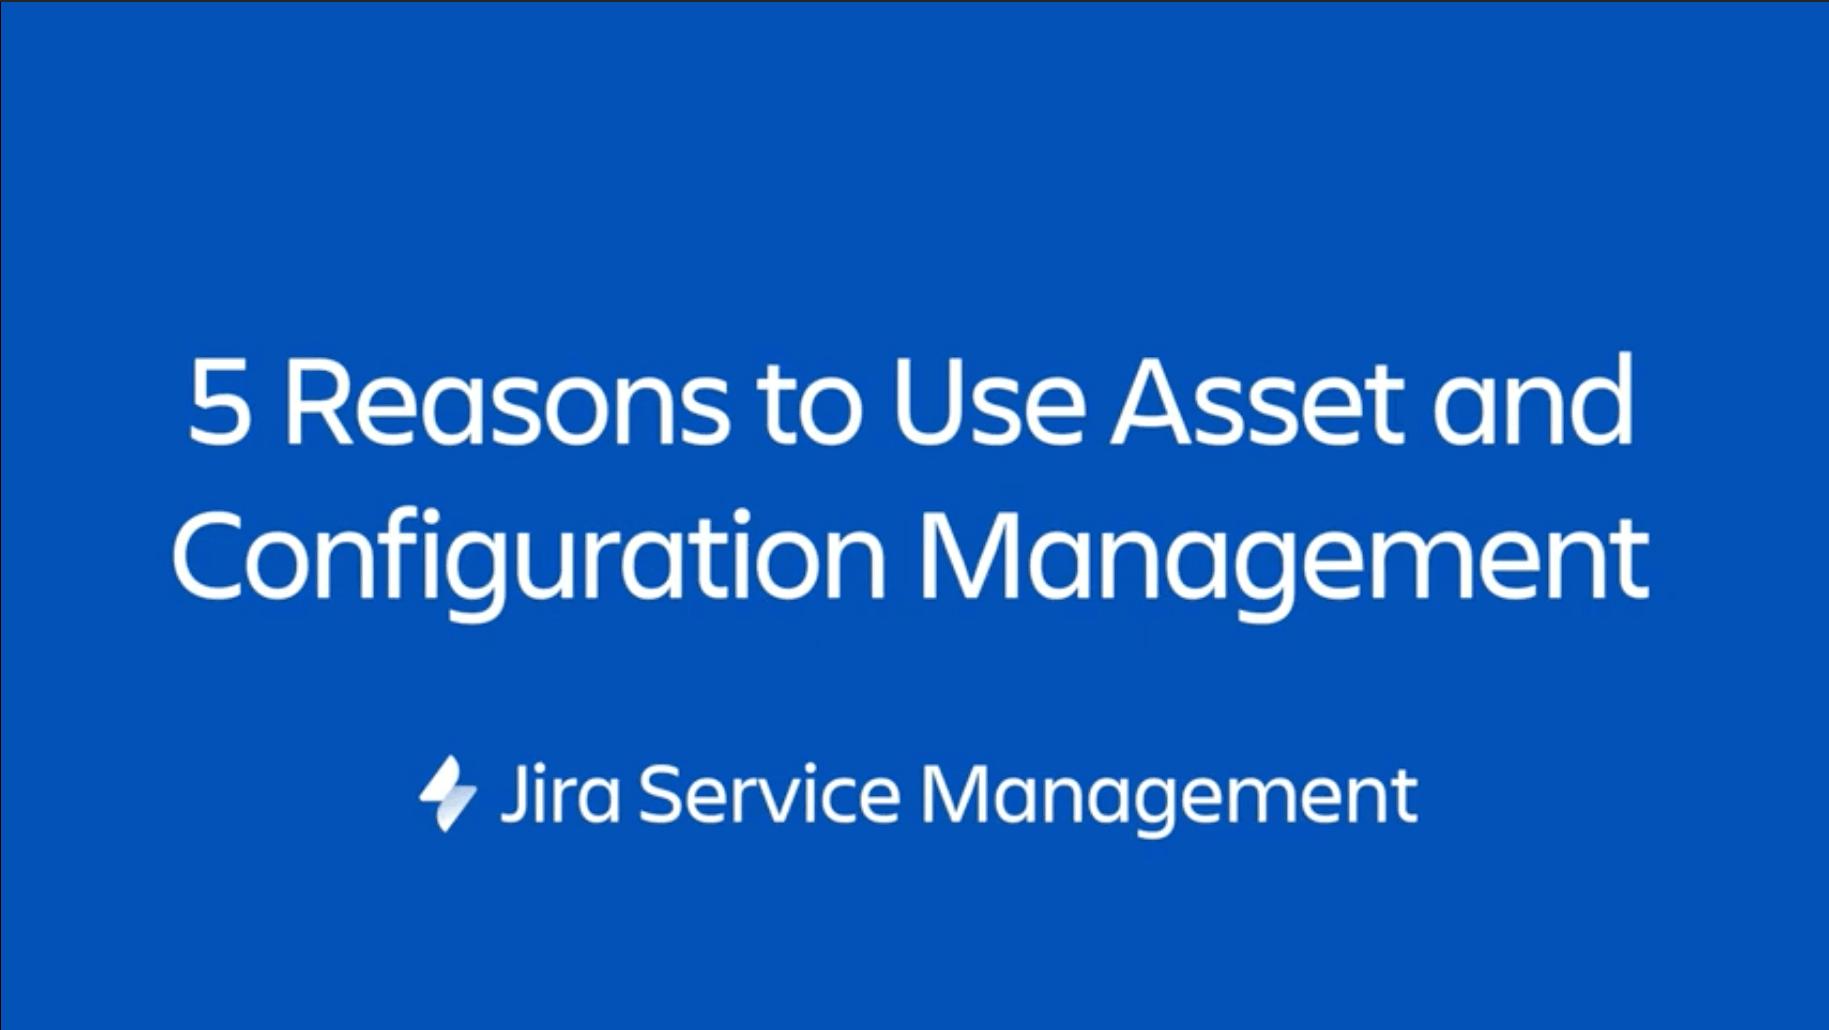 Jira Service Management를 사용하여 Jira Software의 효과를 한 단계 더 업그레이드